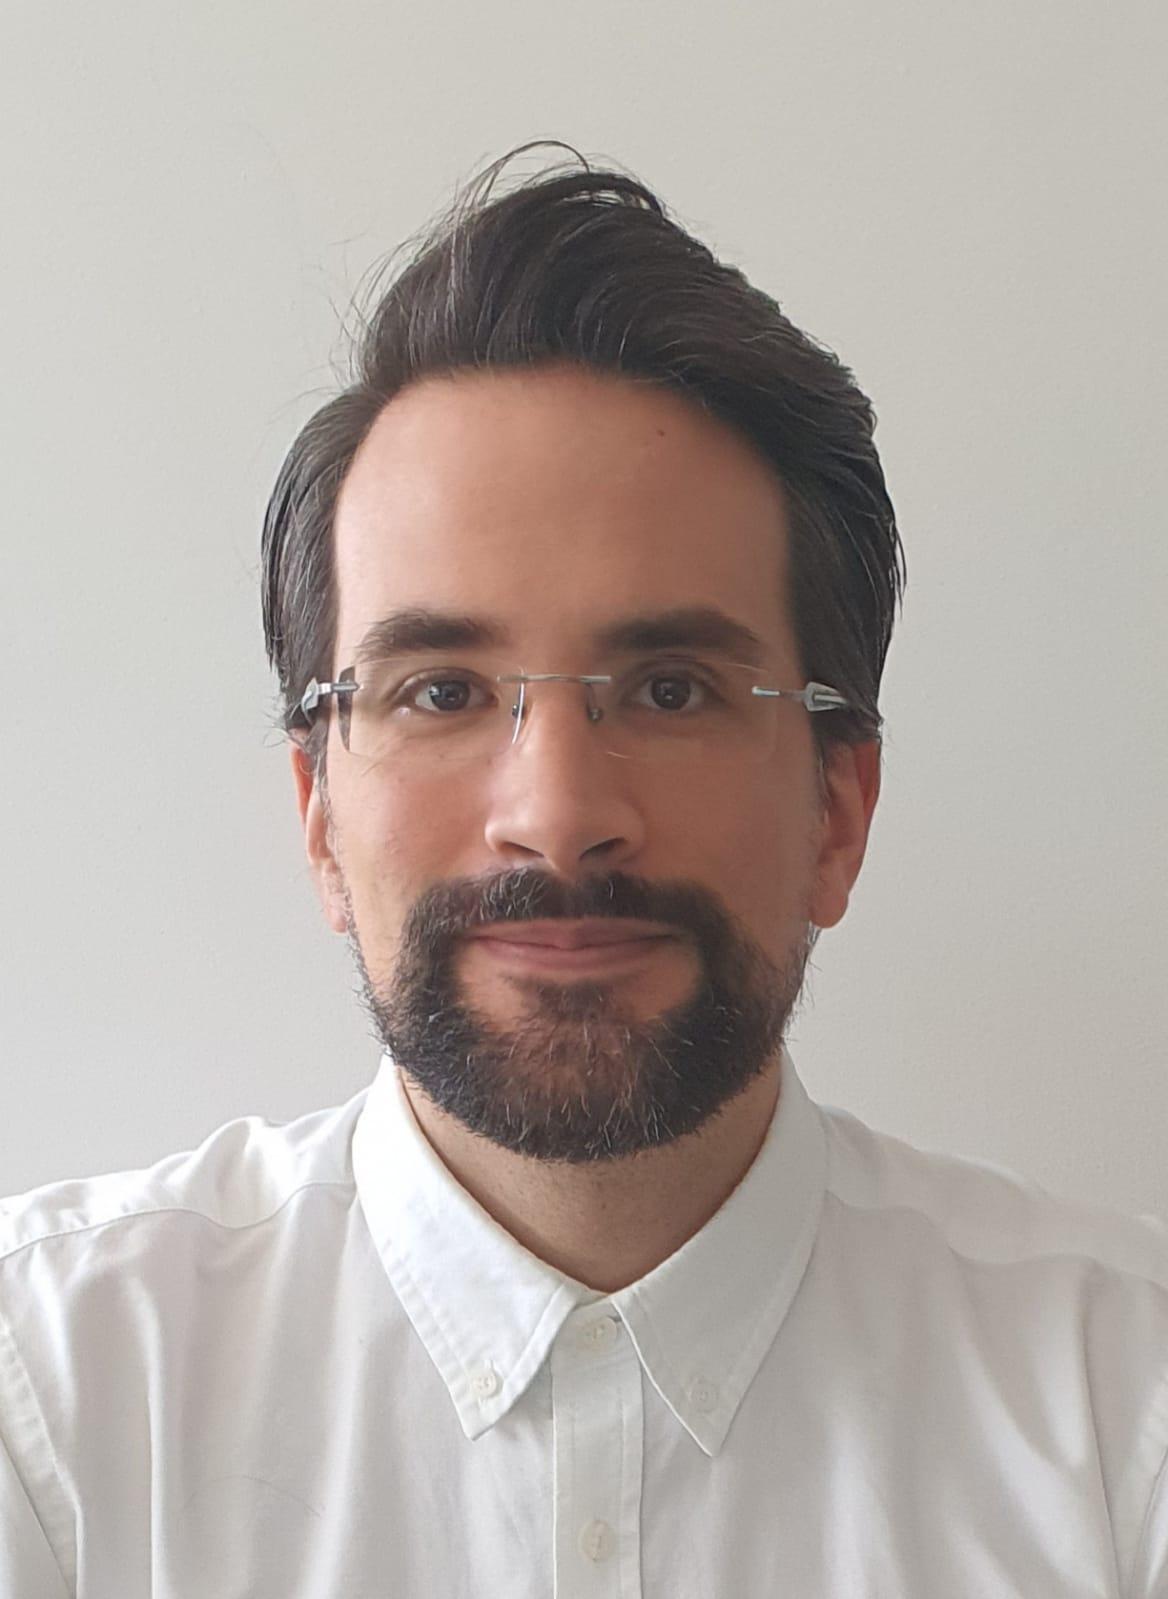 Portrait of Dr David Castro-Perez